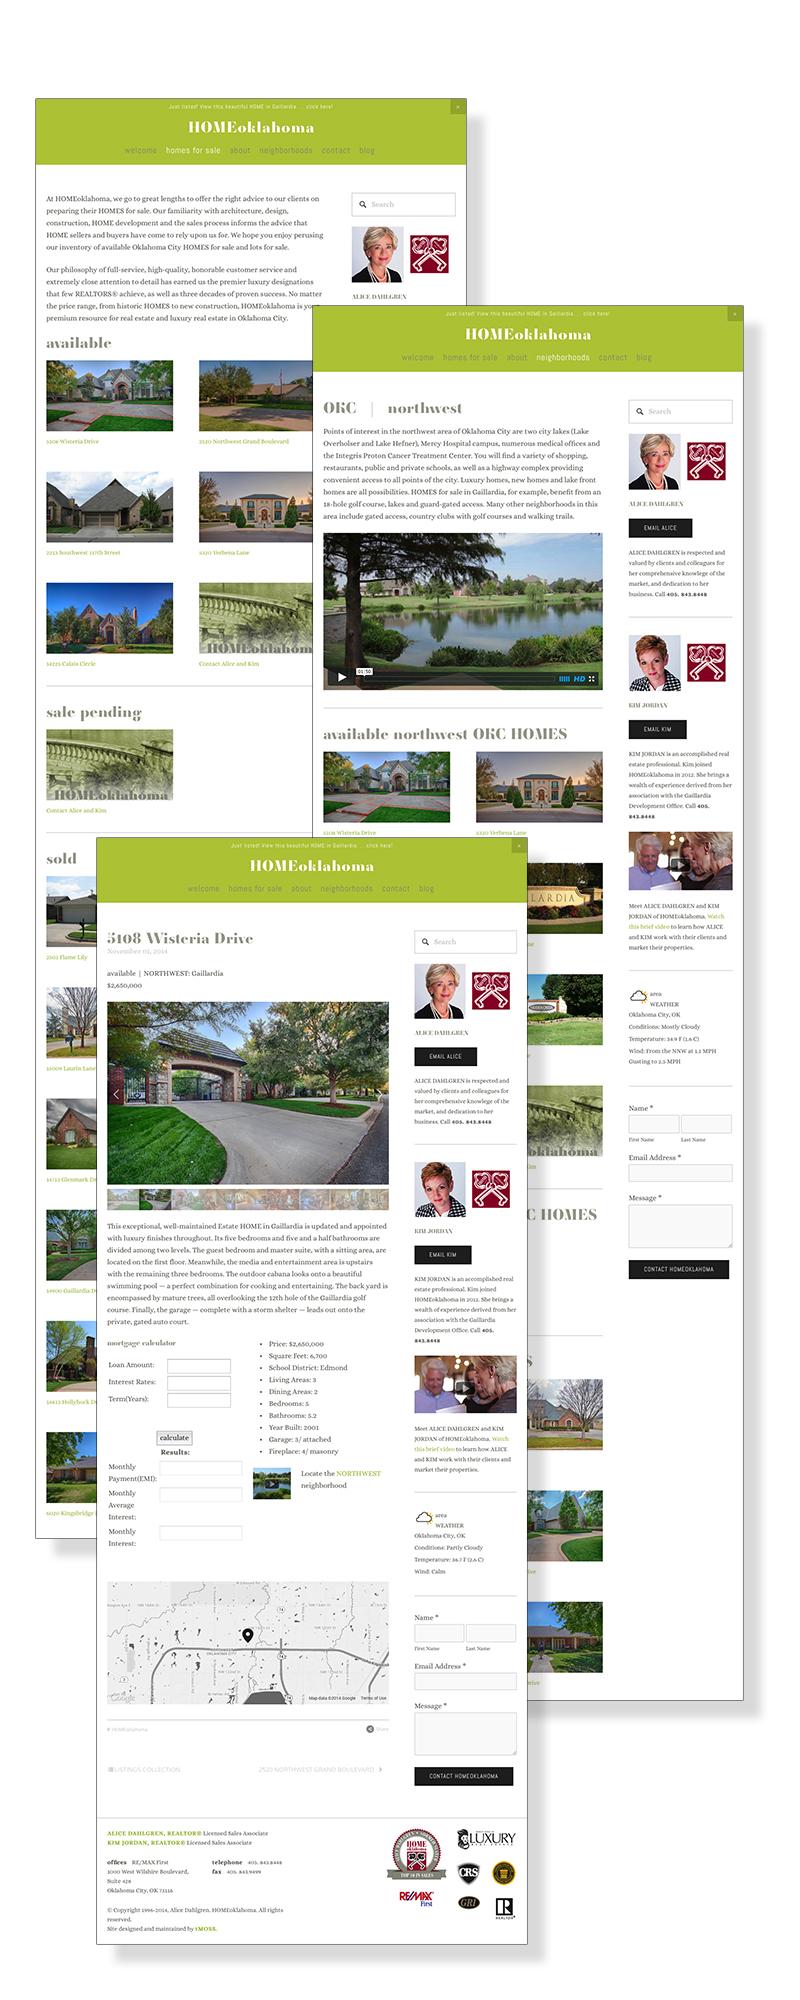 home-oklahoma-pages-tmoss-portfolio.jpg